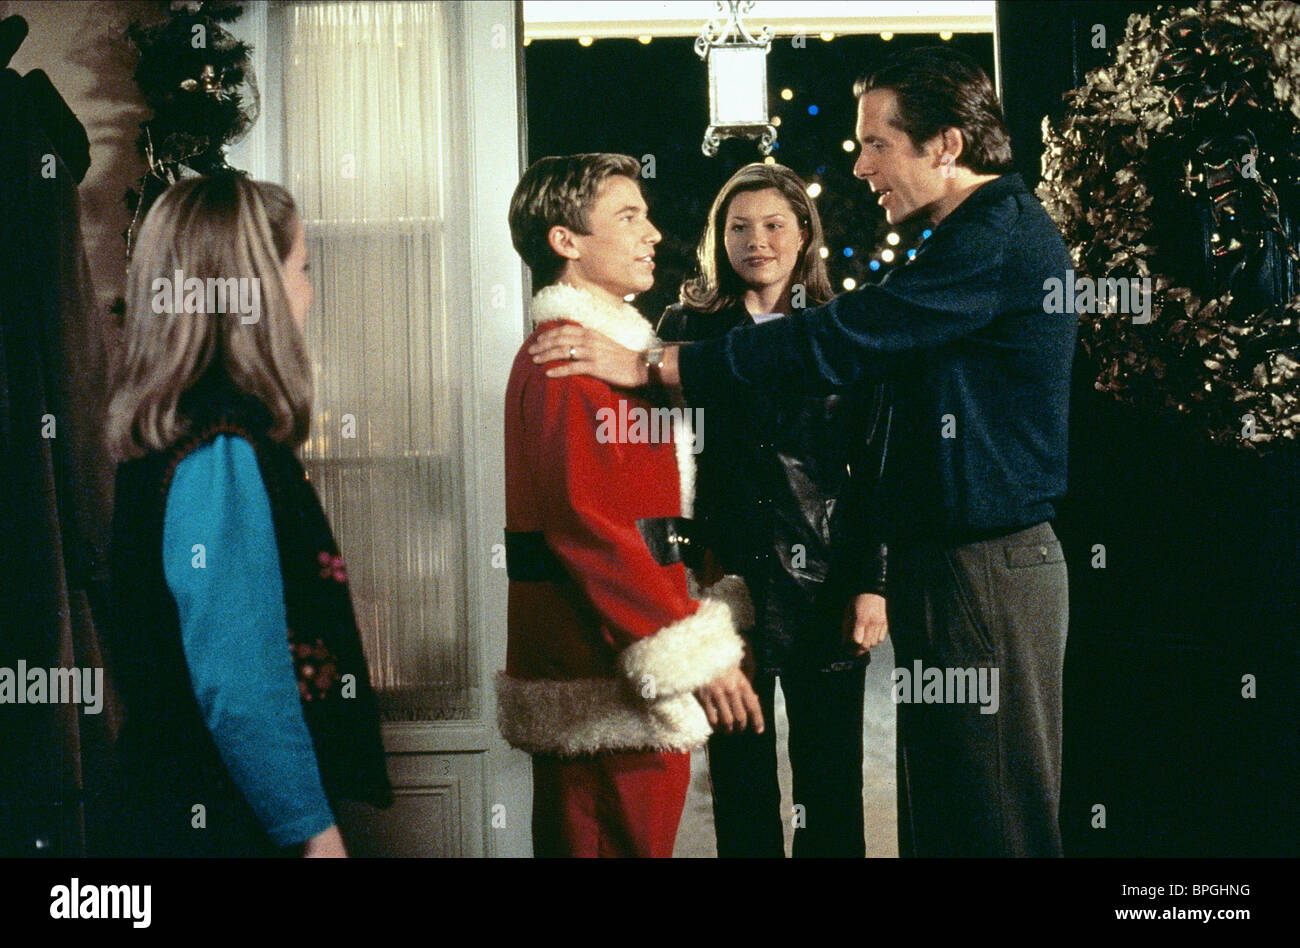 Ill Be Home For Christmas 1998.Lauren Maltby Jonathan Taylor Thomas Jessica Biel Gary